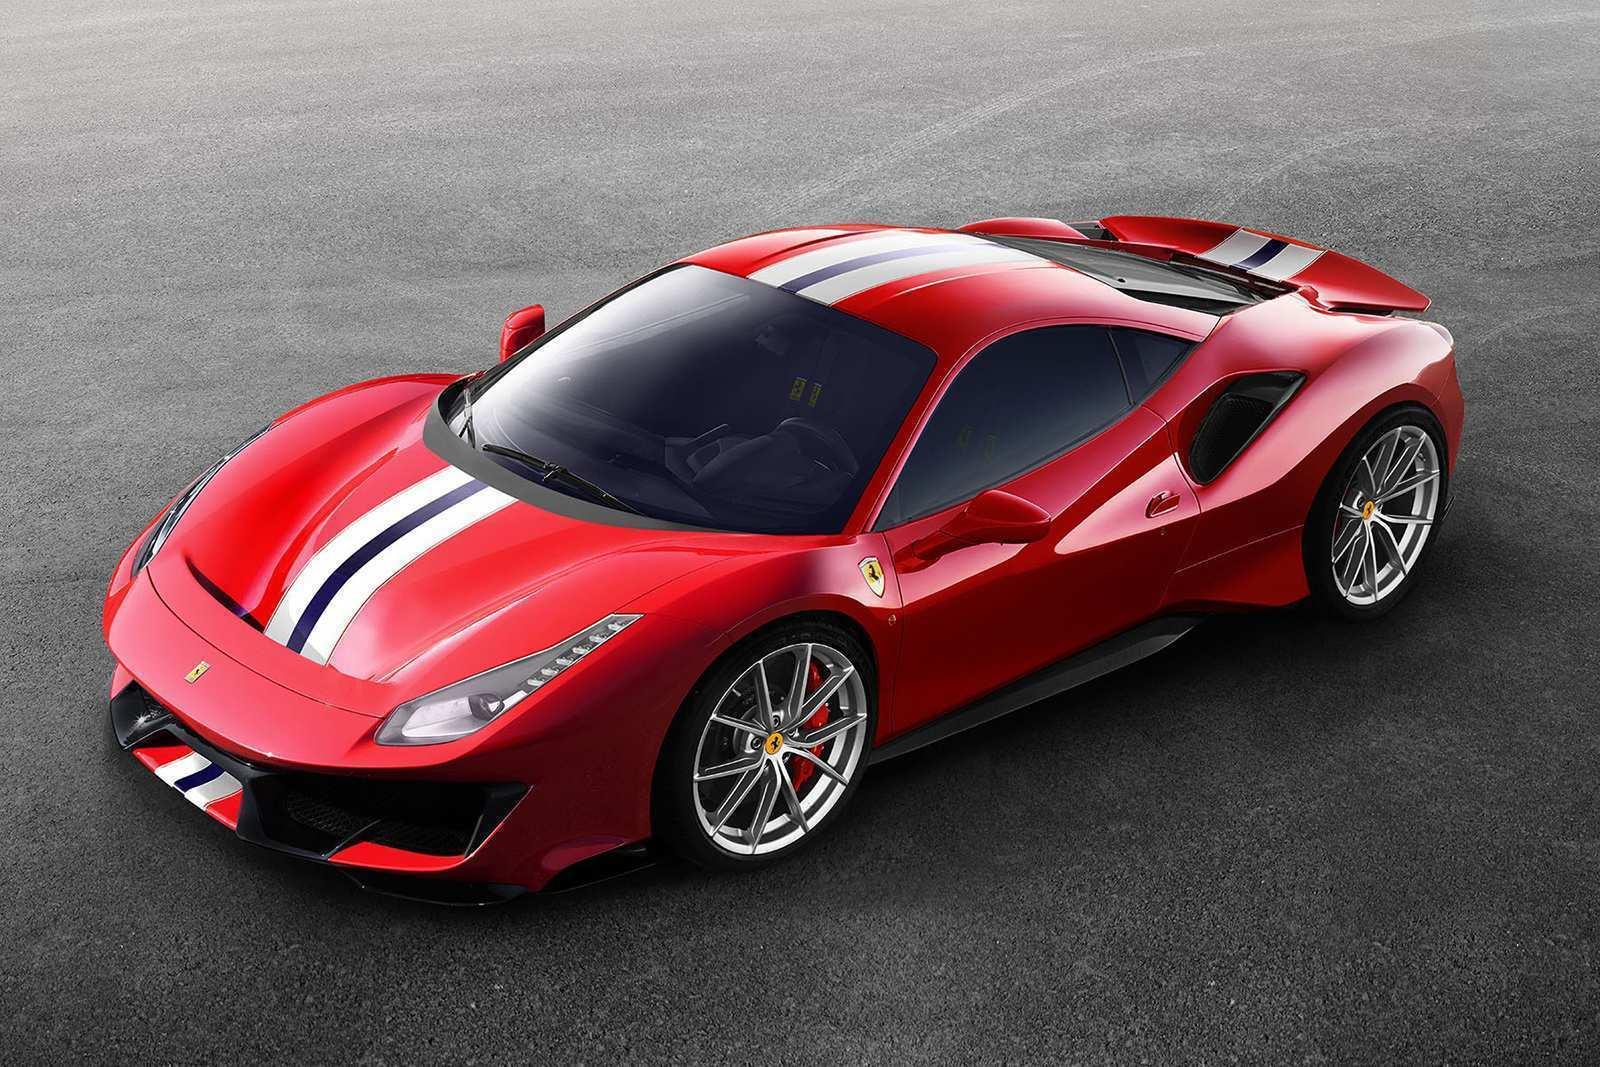 41 All New Ferrari De 2020 First Drive for Ferrari De 2020